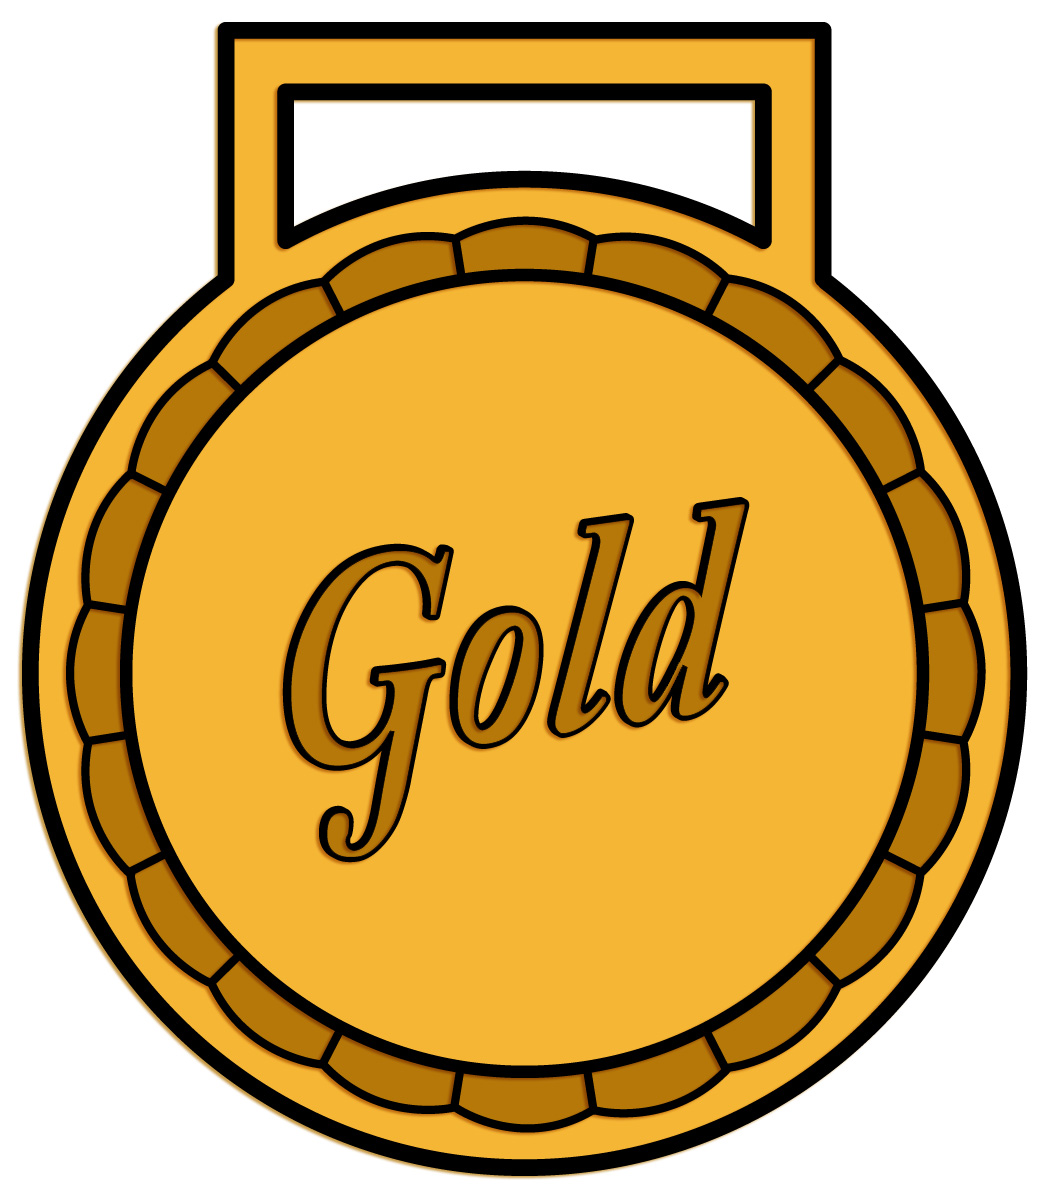 Gold Star Medal Clipart Gold star meda.